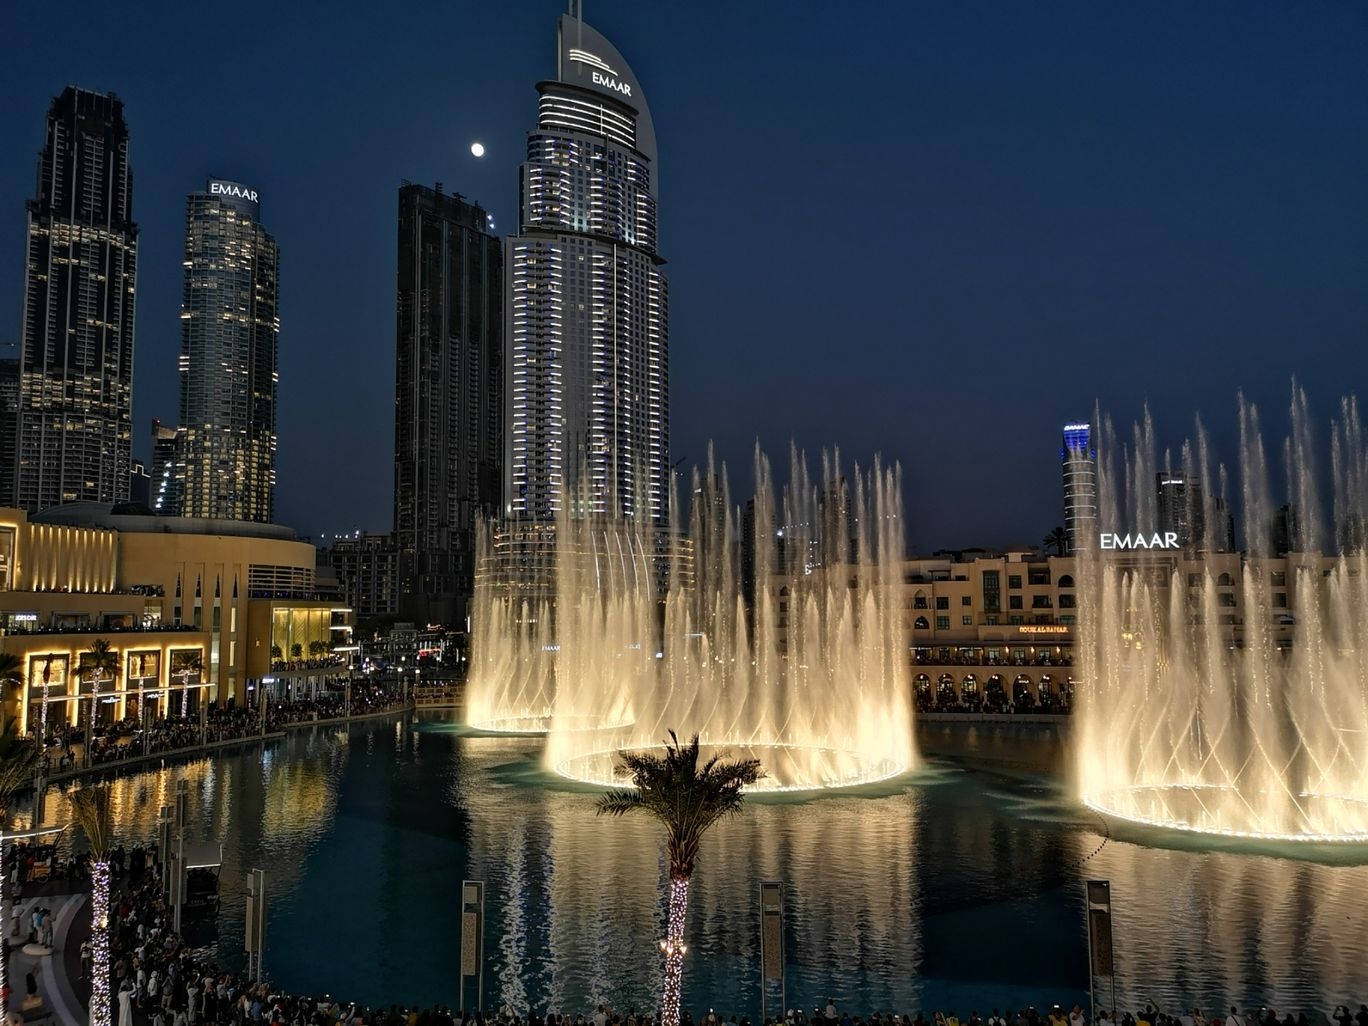 Photo of Dubai - United Arab Emirates By Sultan Saad